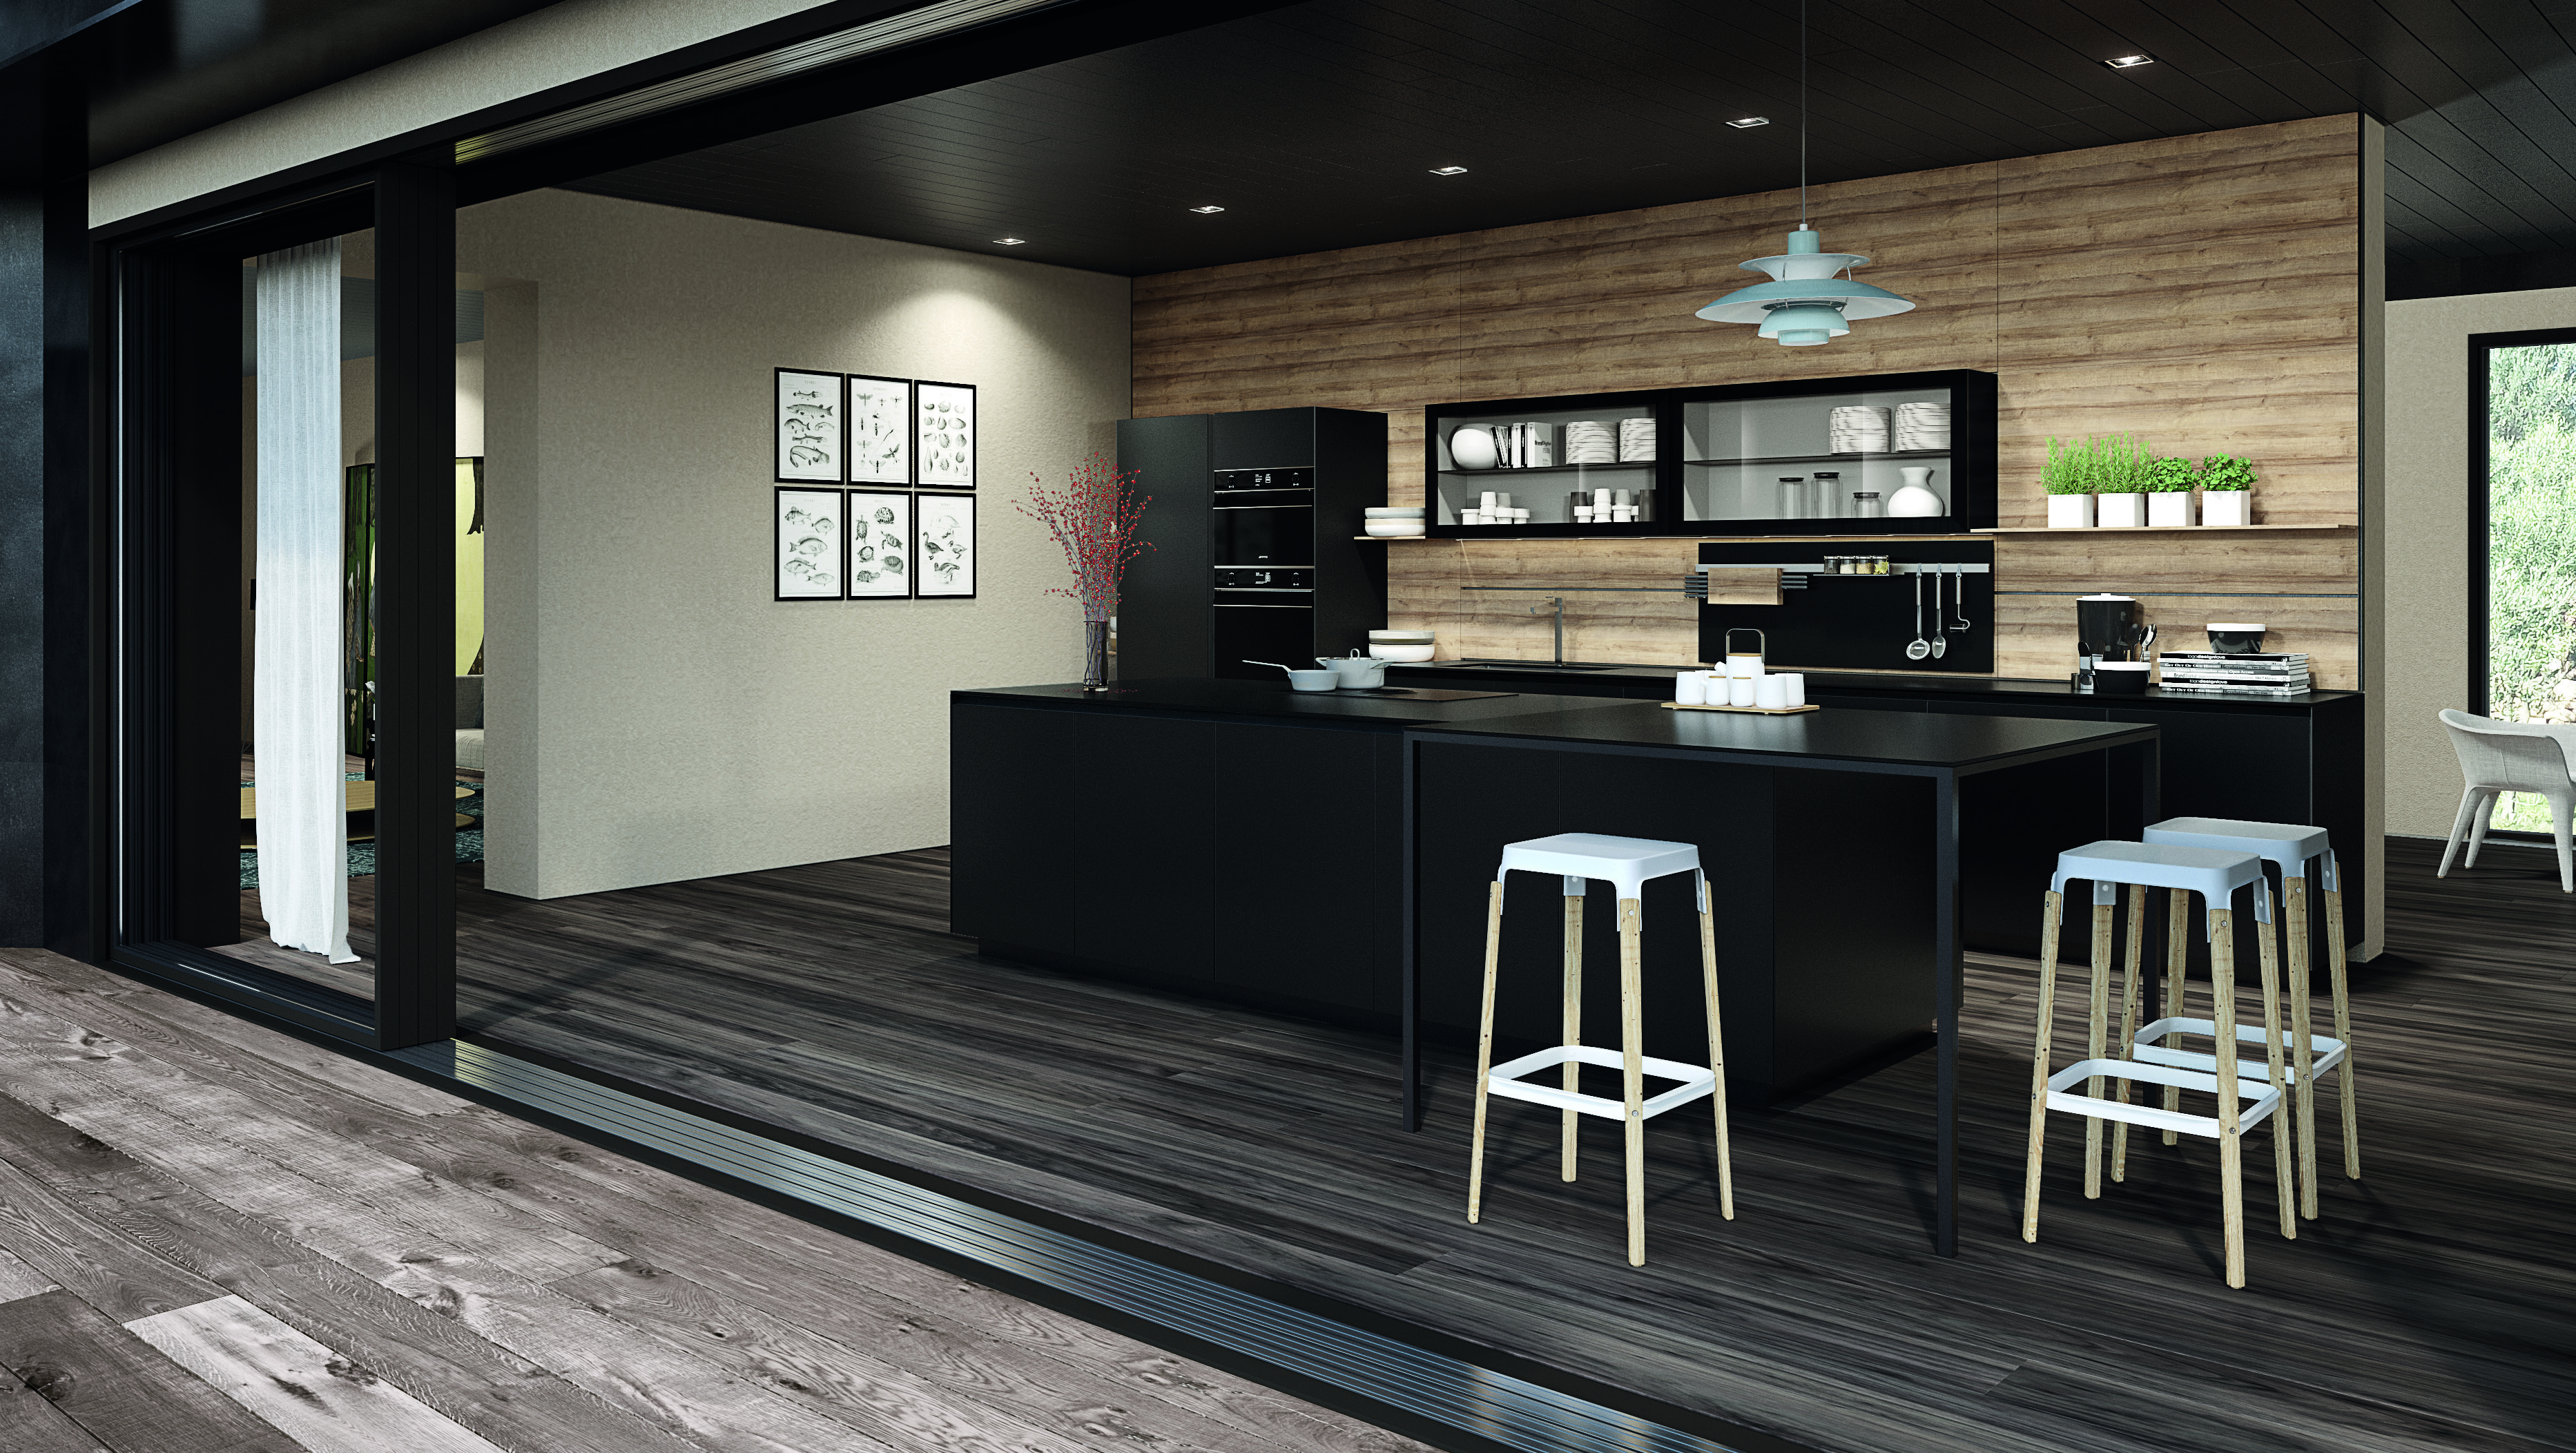 antis kitchen furniture euromobil design euromobil. 3 Antis Kitchen Furniture Euromobil Design